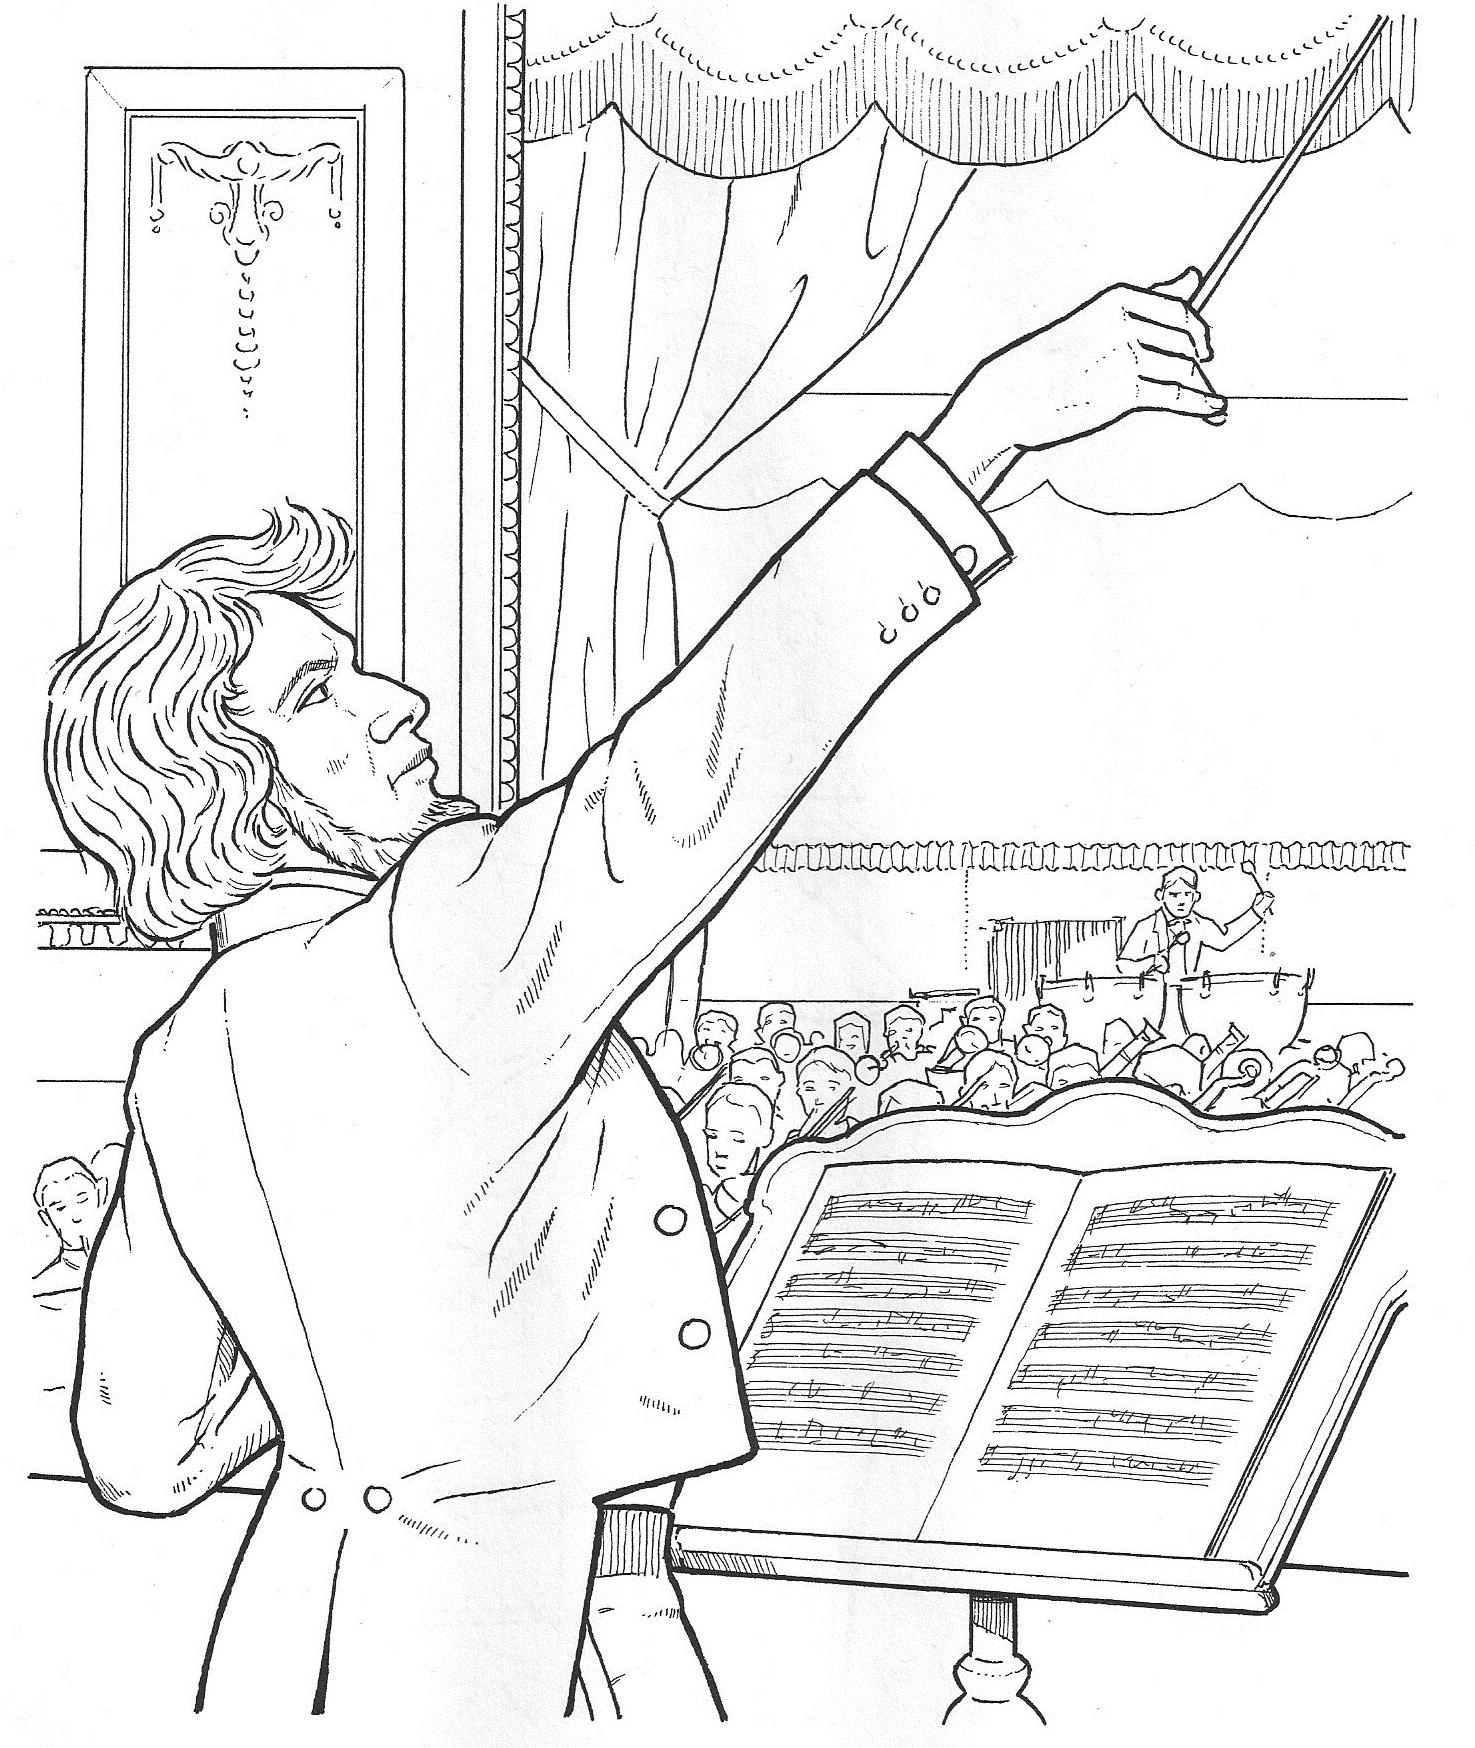 berlioz - Composer Coloring